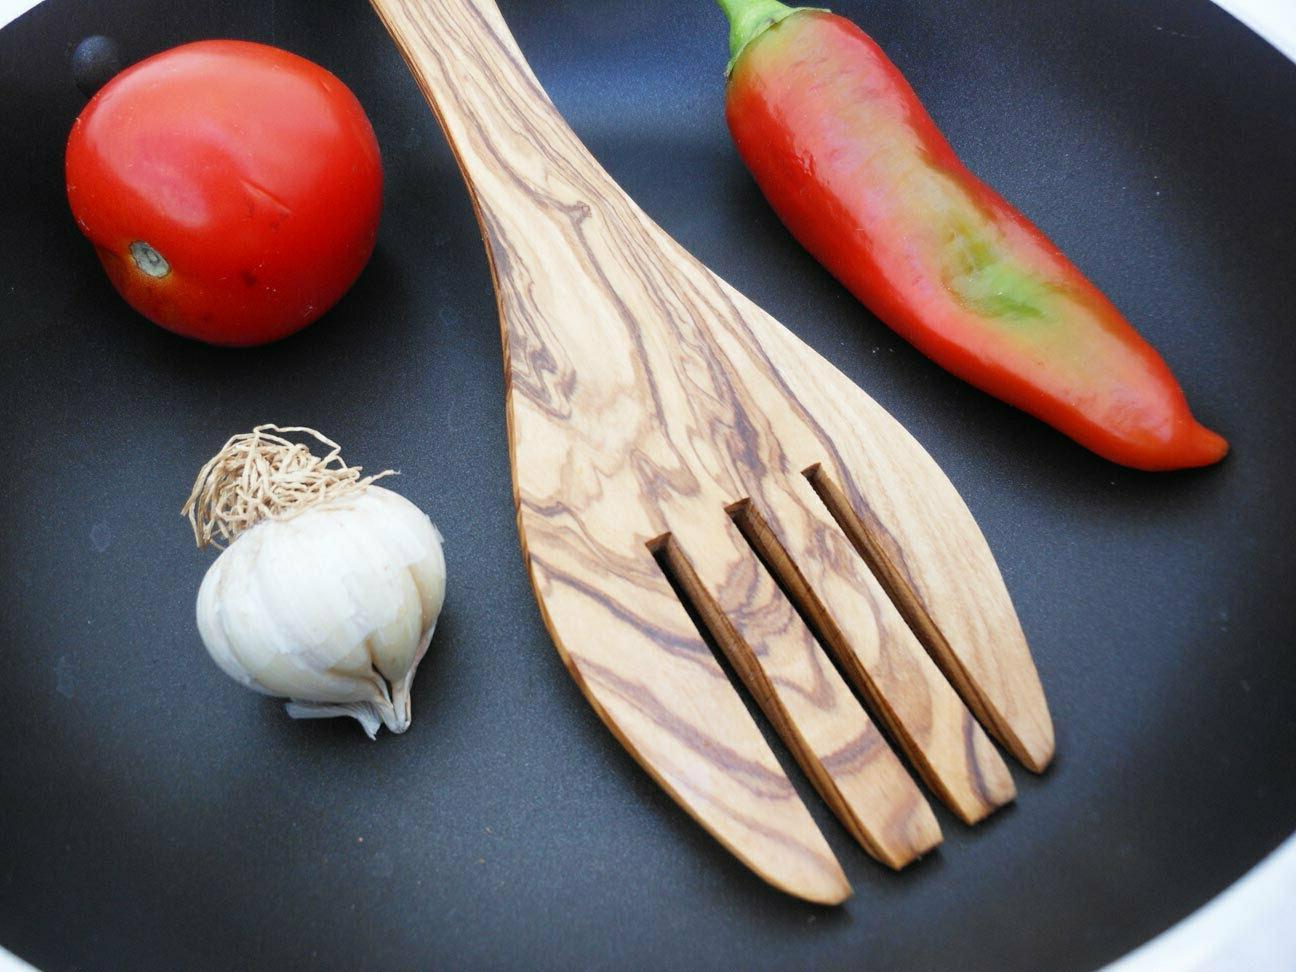 Olive Spoon Cooking Serving Utensil Spoon